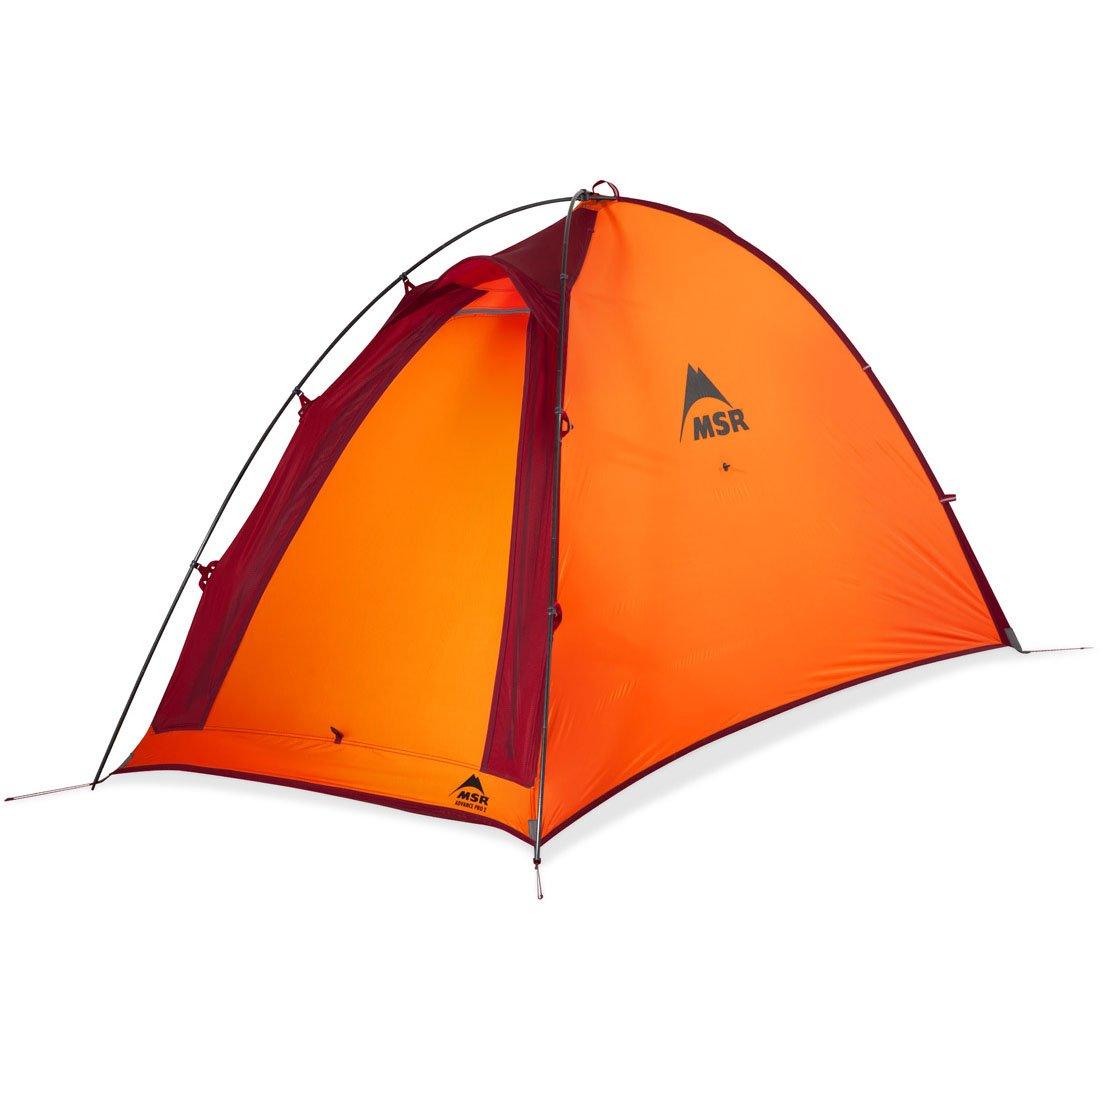 MSR Advance Pro 2 Person Tent